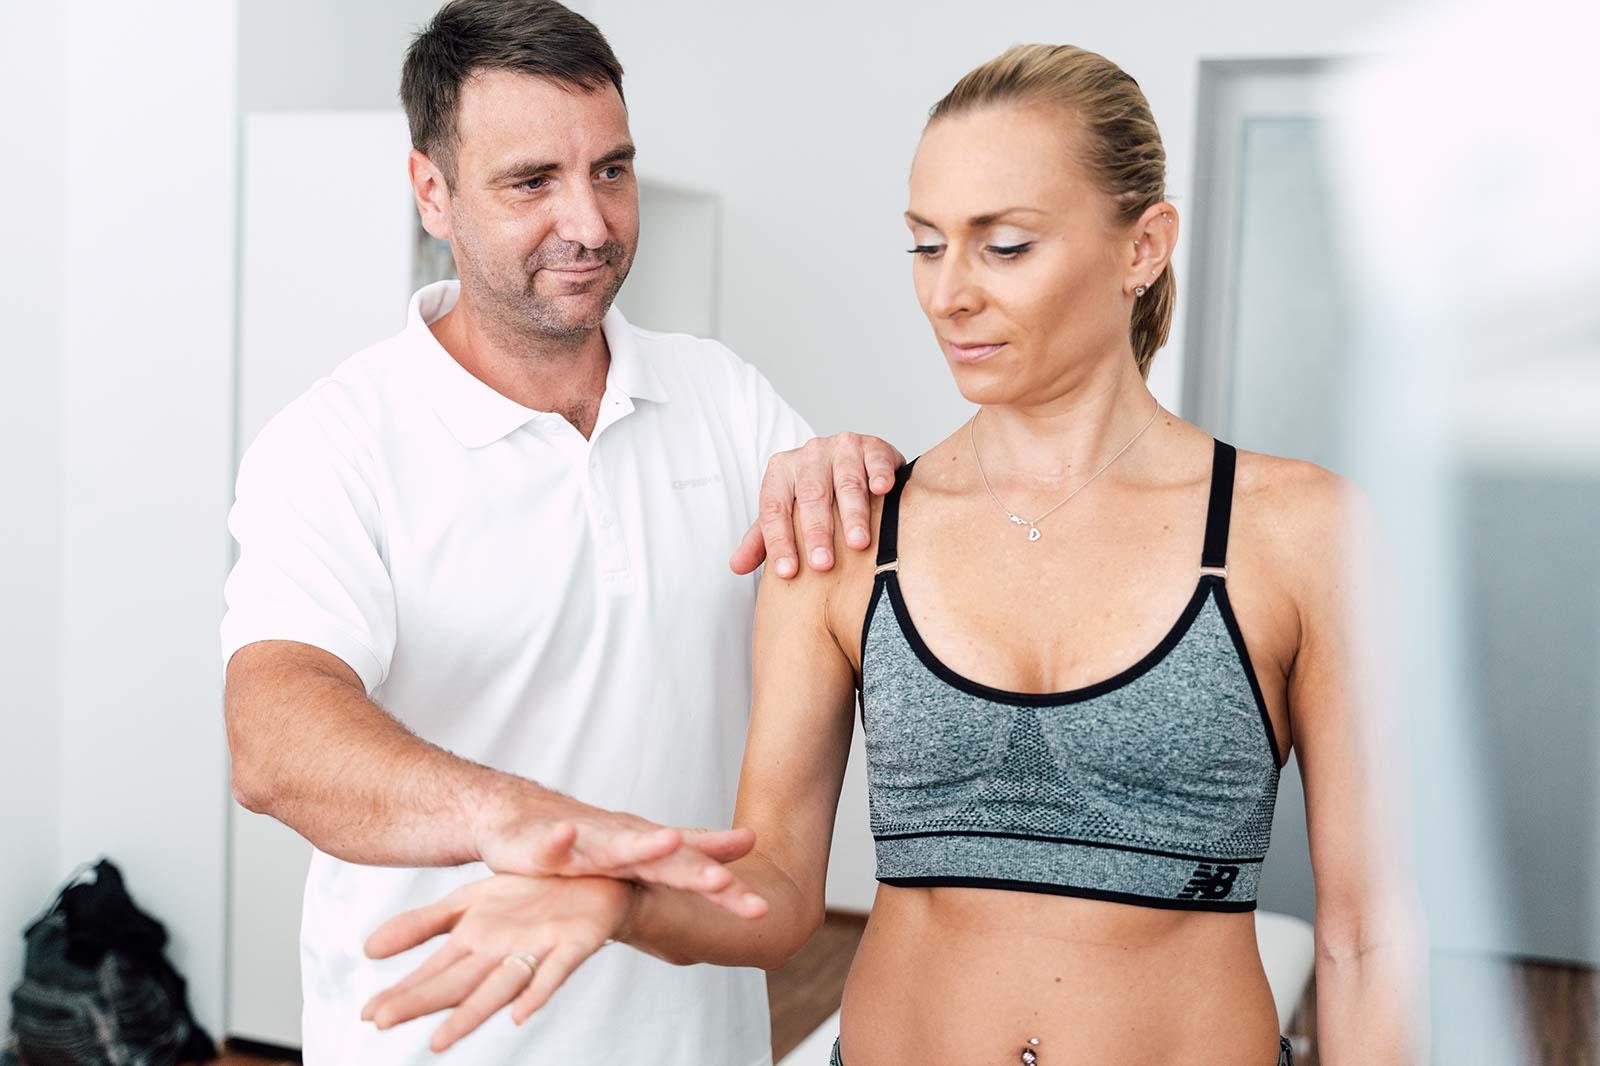 Konservative Behandlung der Schulter durch OA Dr. Dominik Meraner im medsyn, Wien